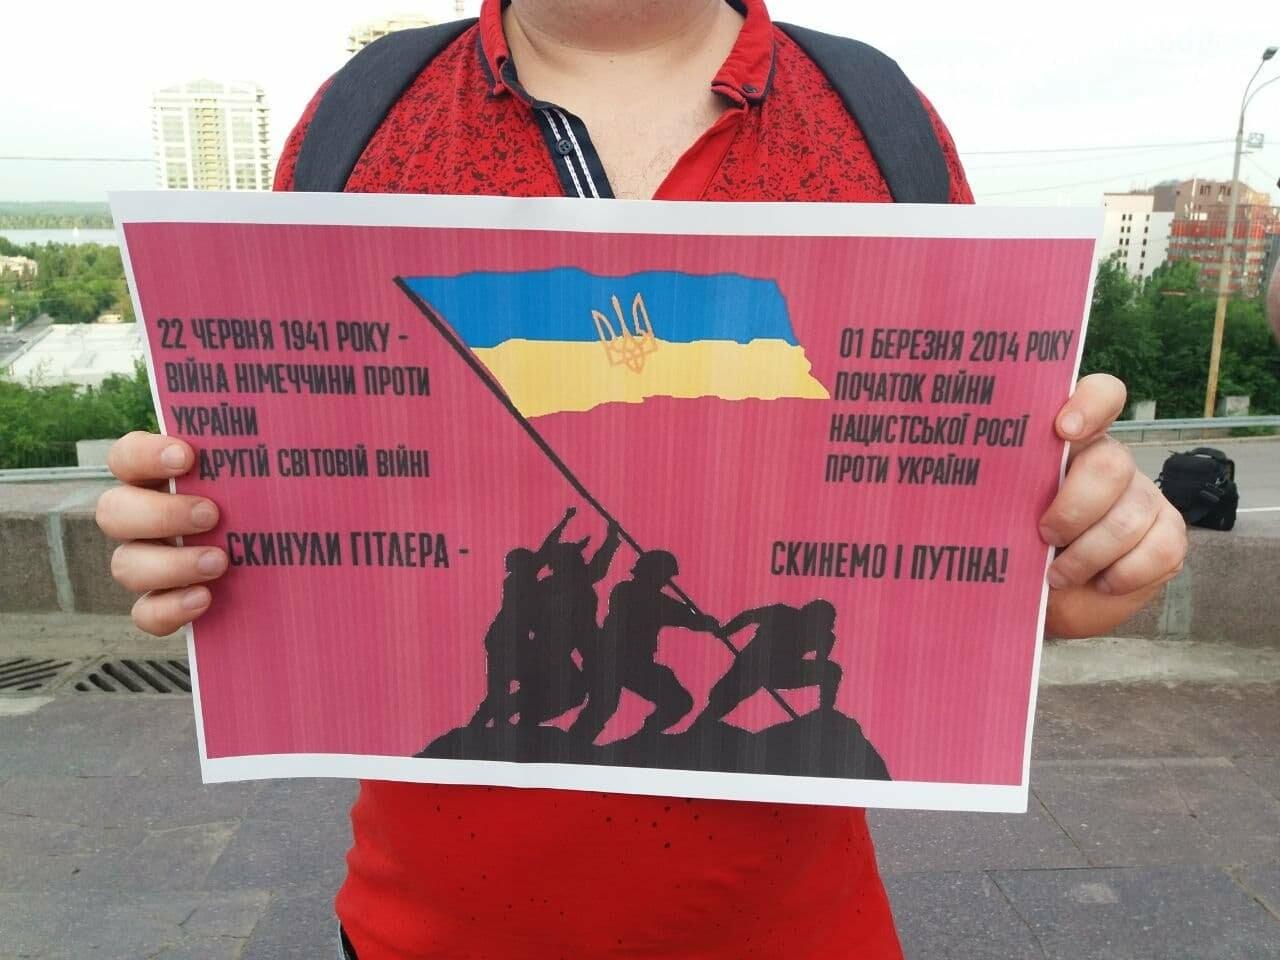 В Днепре активисты заявили, что победят Путина, - ФОТО, ВИДЕО, фото-3